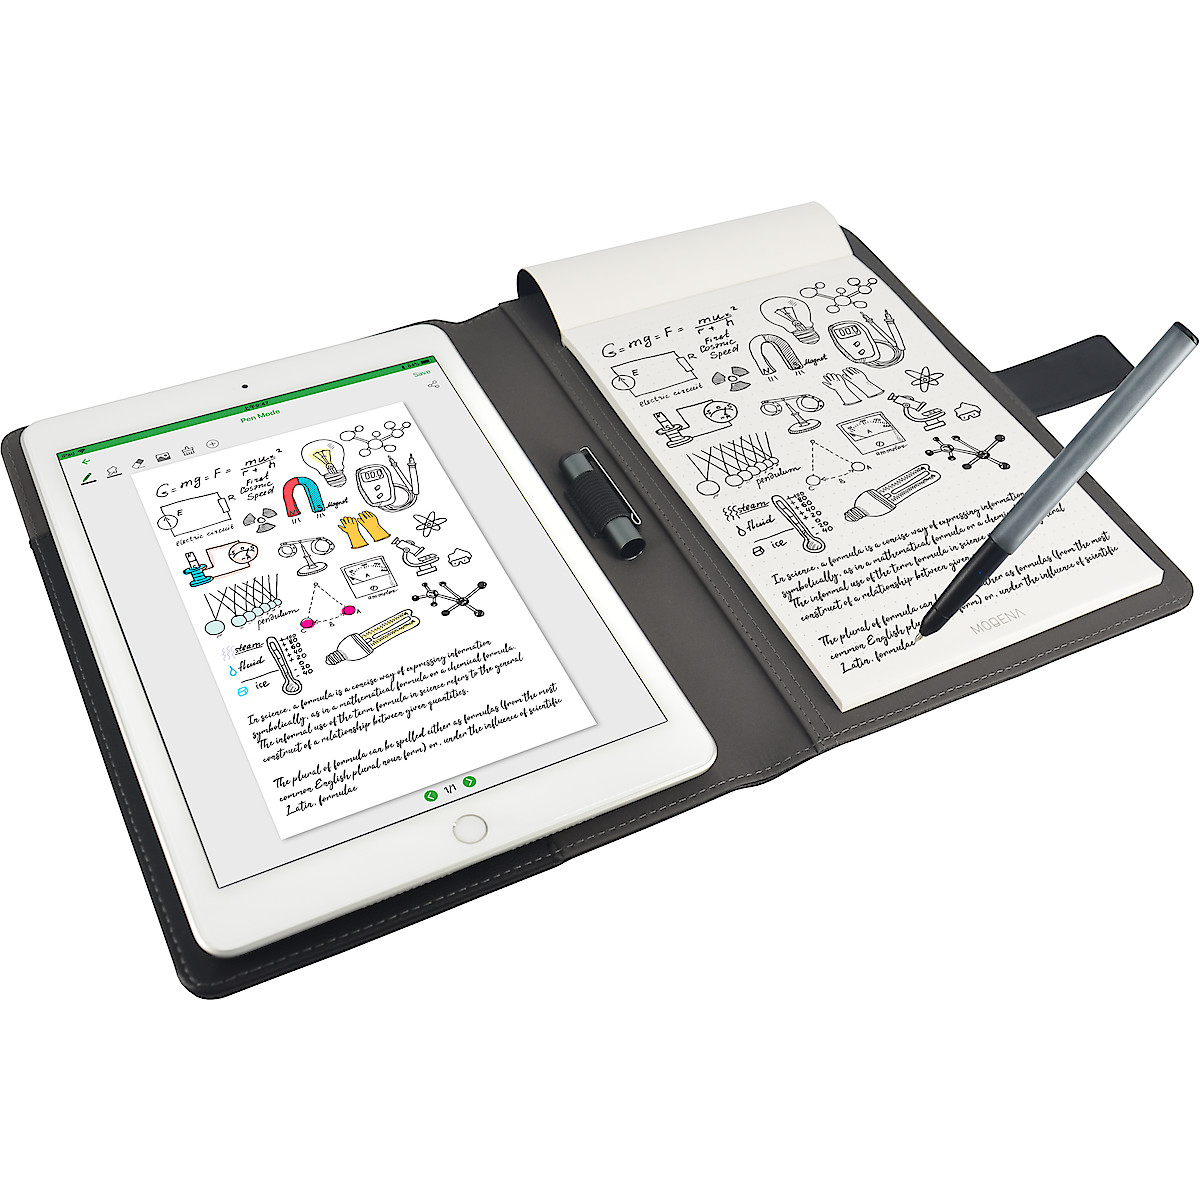 Modena Digital Folio Essential, Notebook and Pen, Black